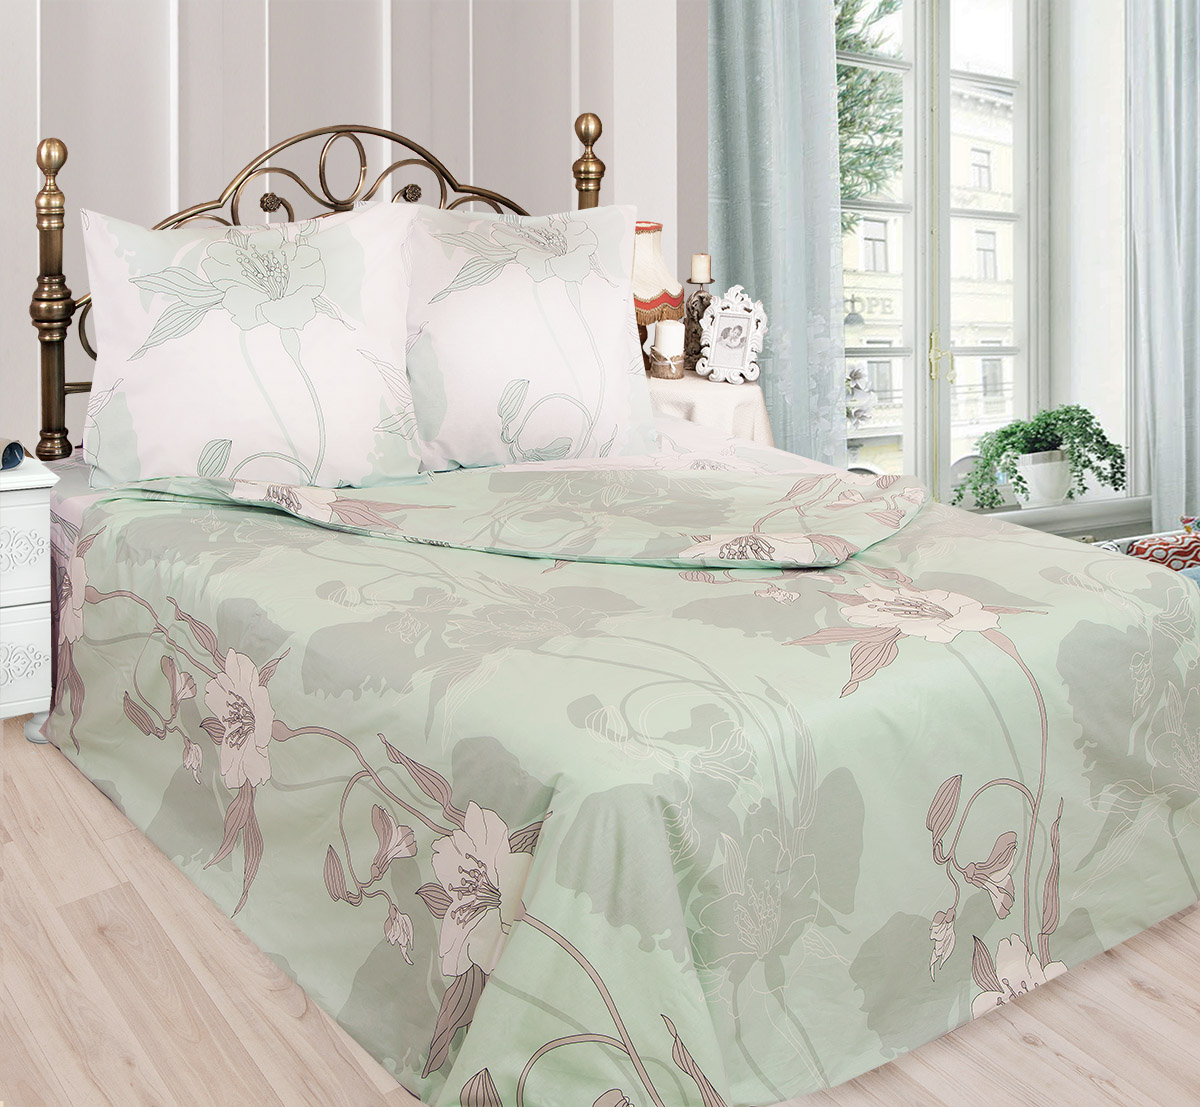 Комплект белья Sova & Javoronok Жасмин (семейный КПБ, бязь), n50, цвет: белый, зеленый sova